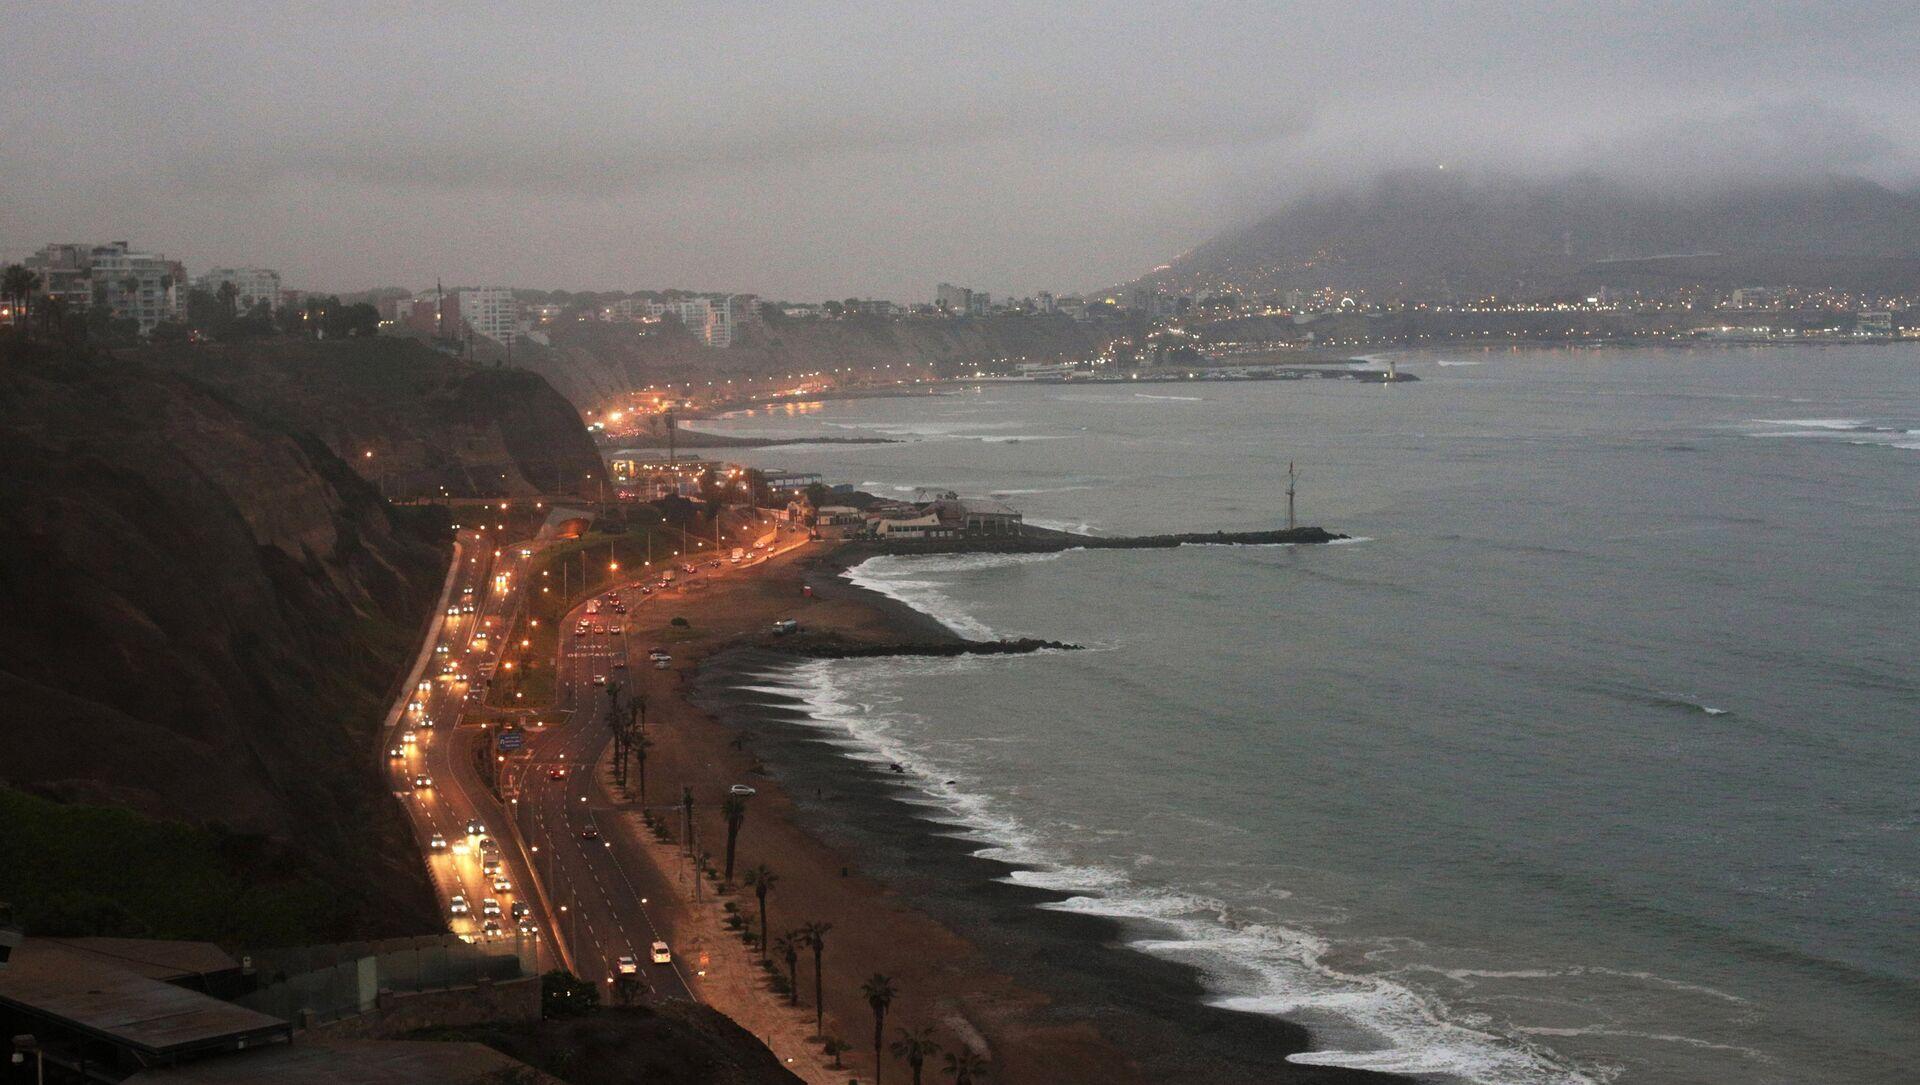 Lima, Perù - Sputnik Italia, 1920, 25.04.2021